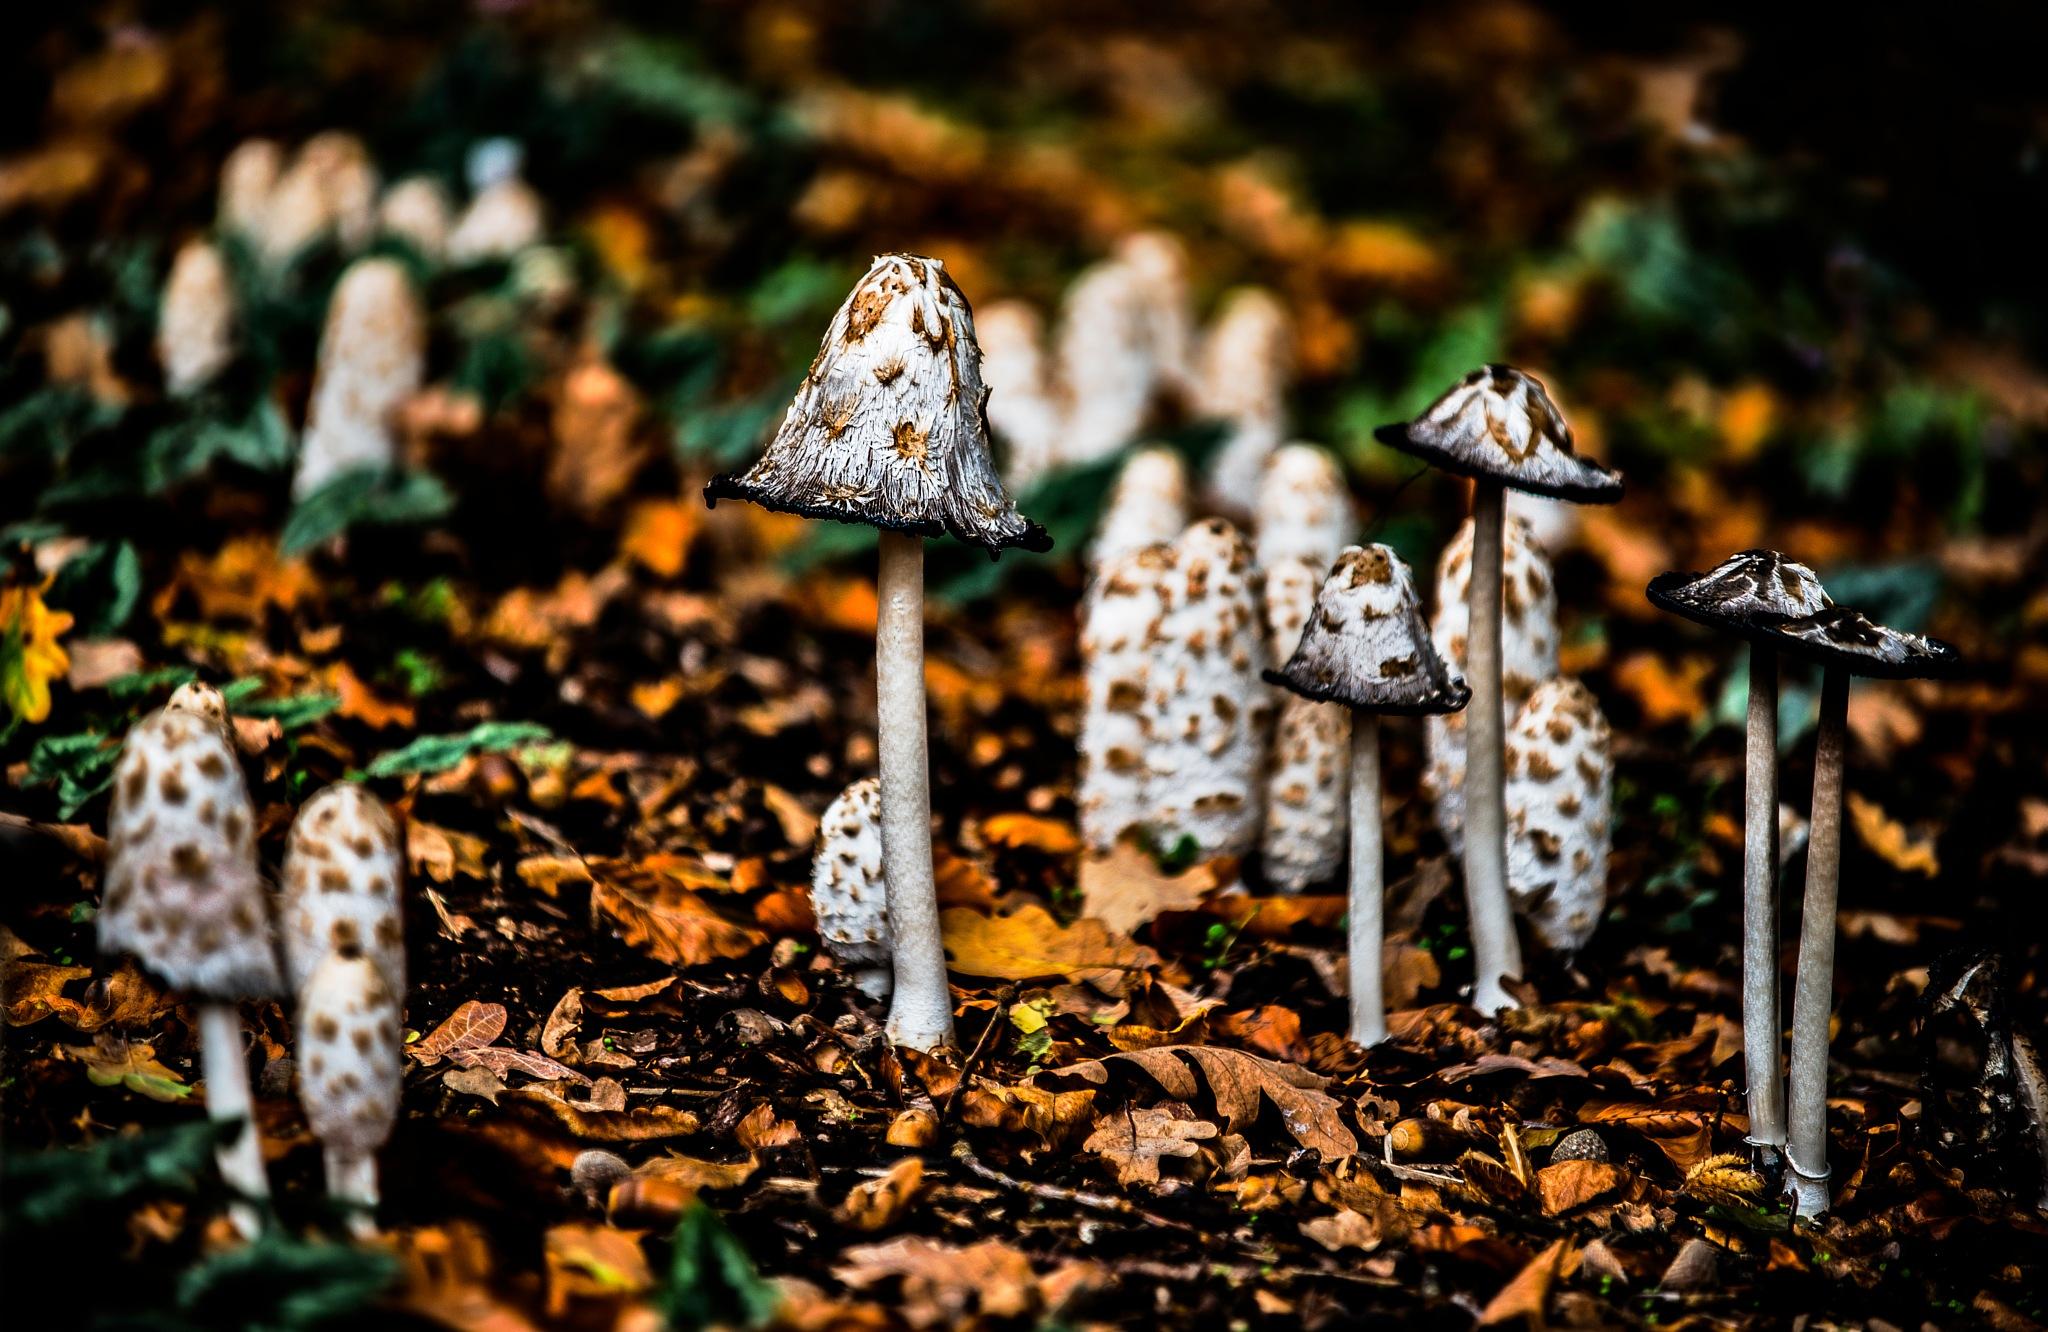 Fungi by MarkGray